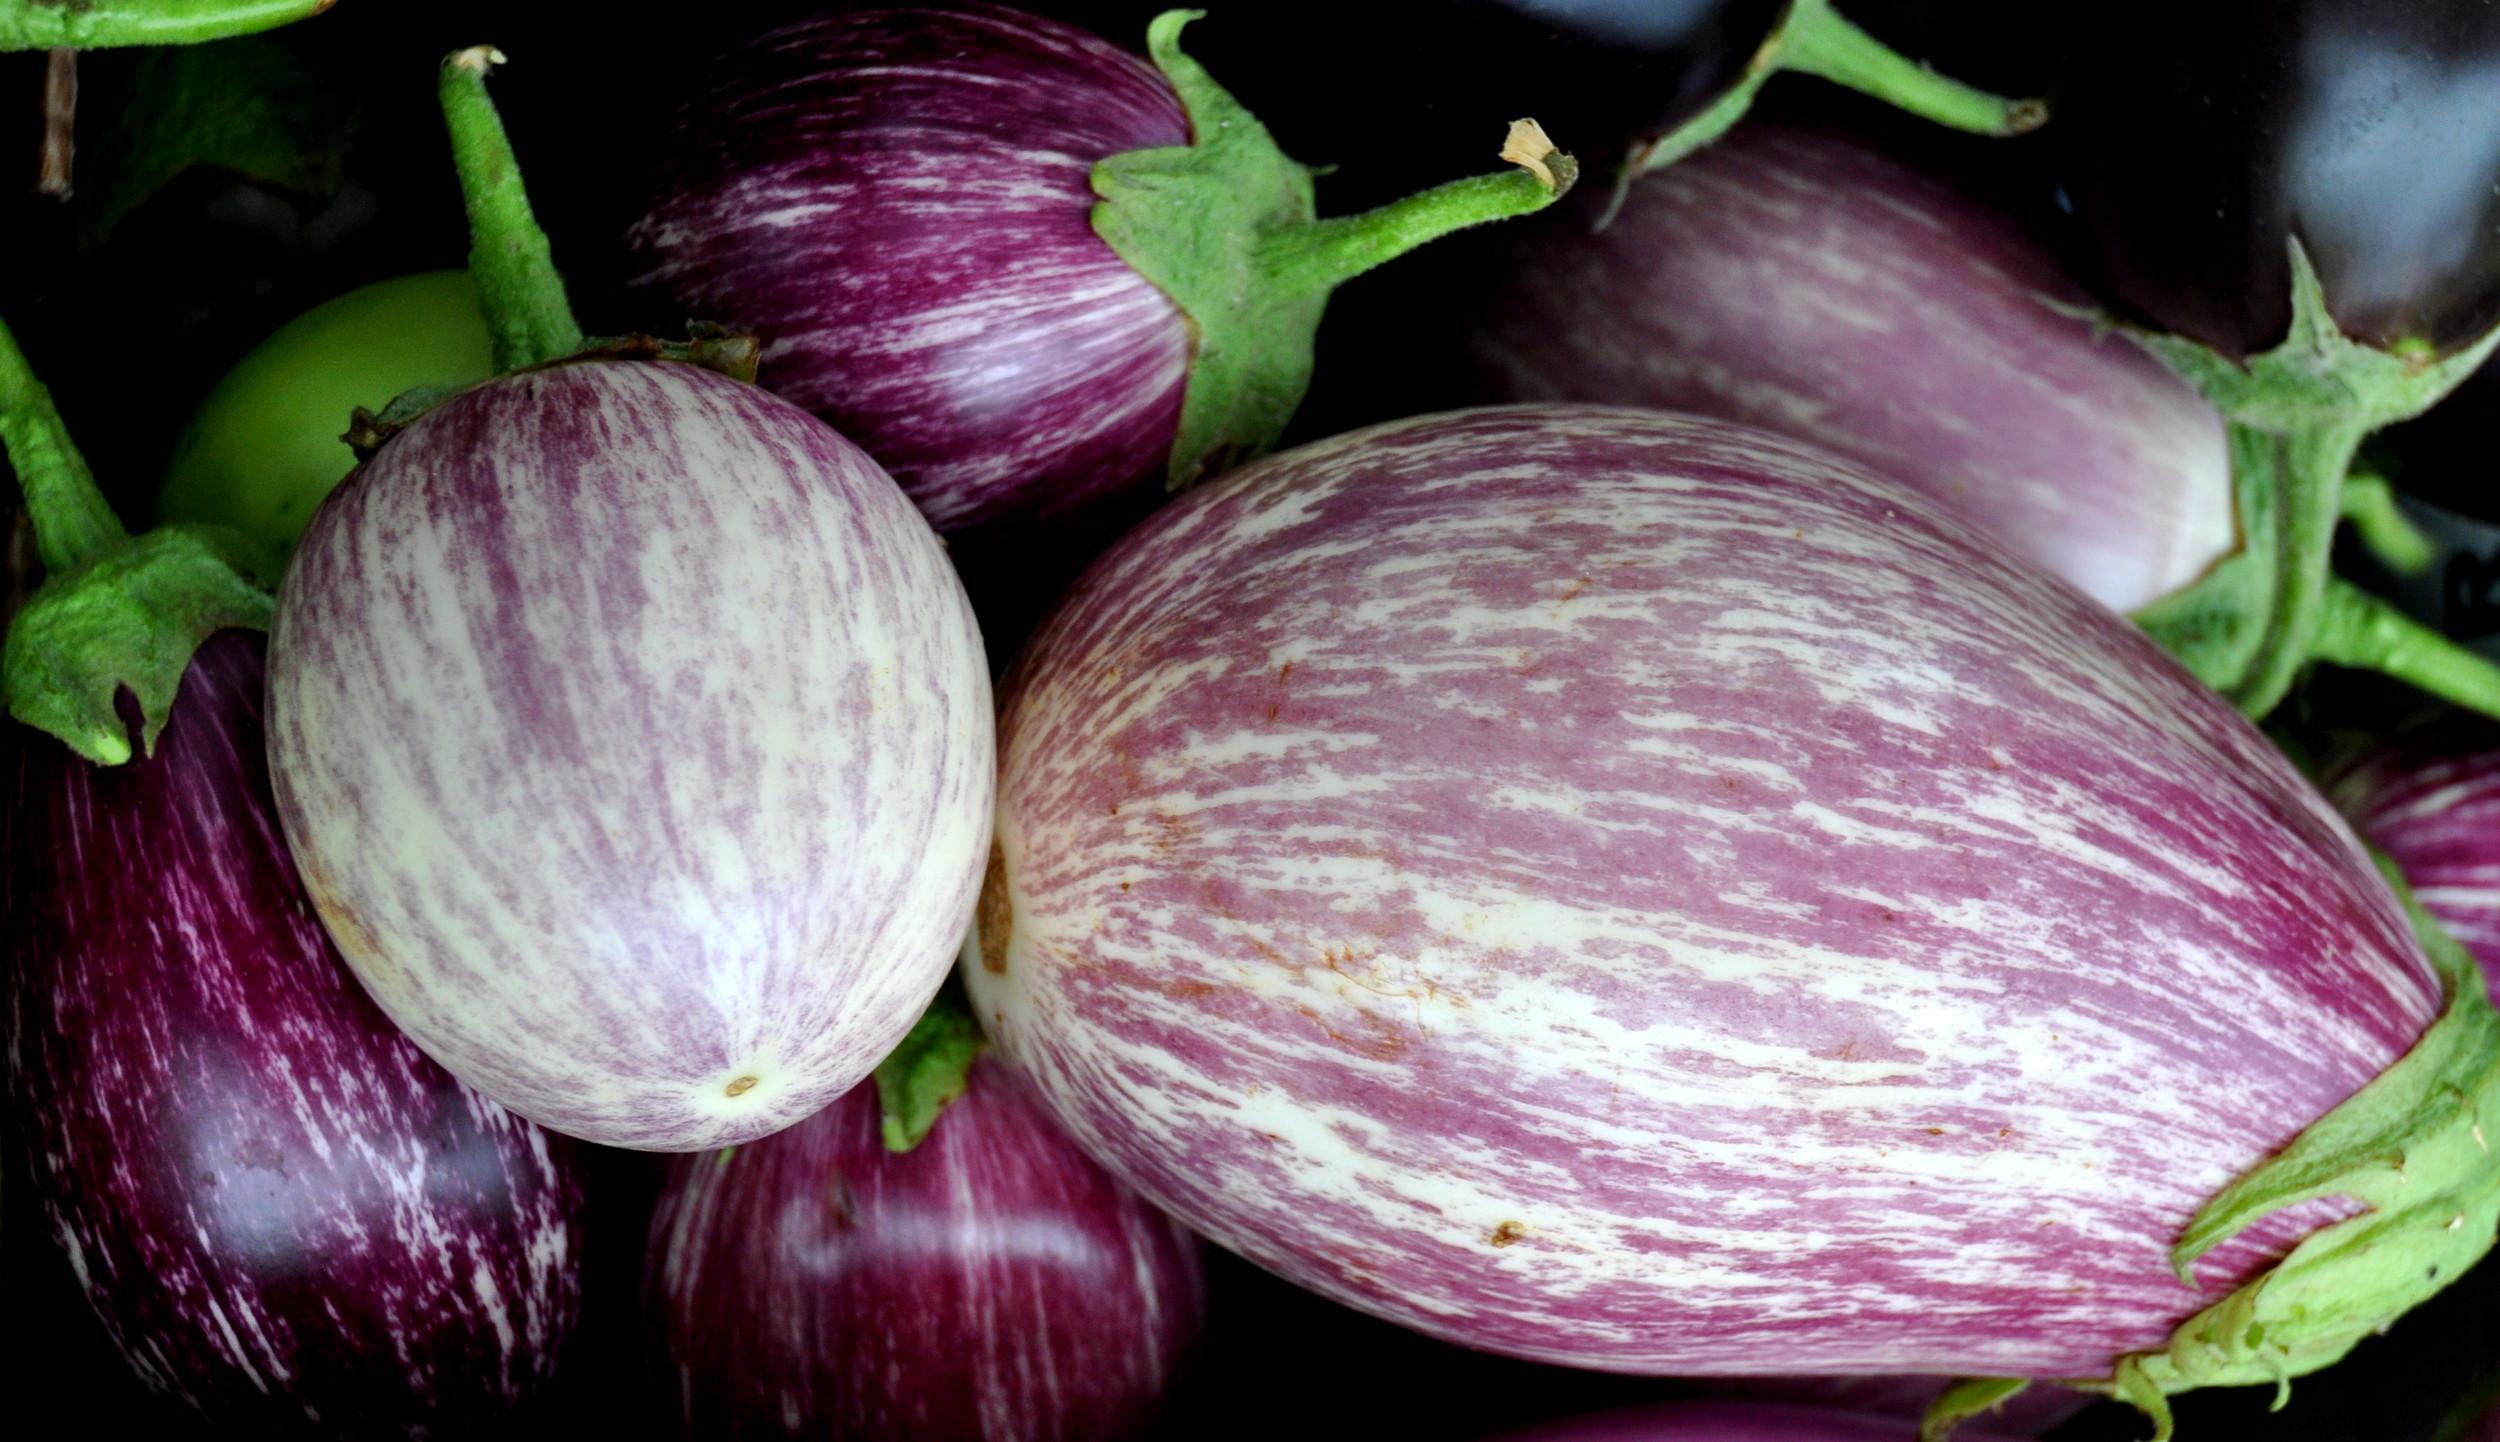 Purple Rain eggplant from Alvarez Organic Farms. Copyright Zachary D. Lyons.